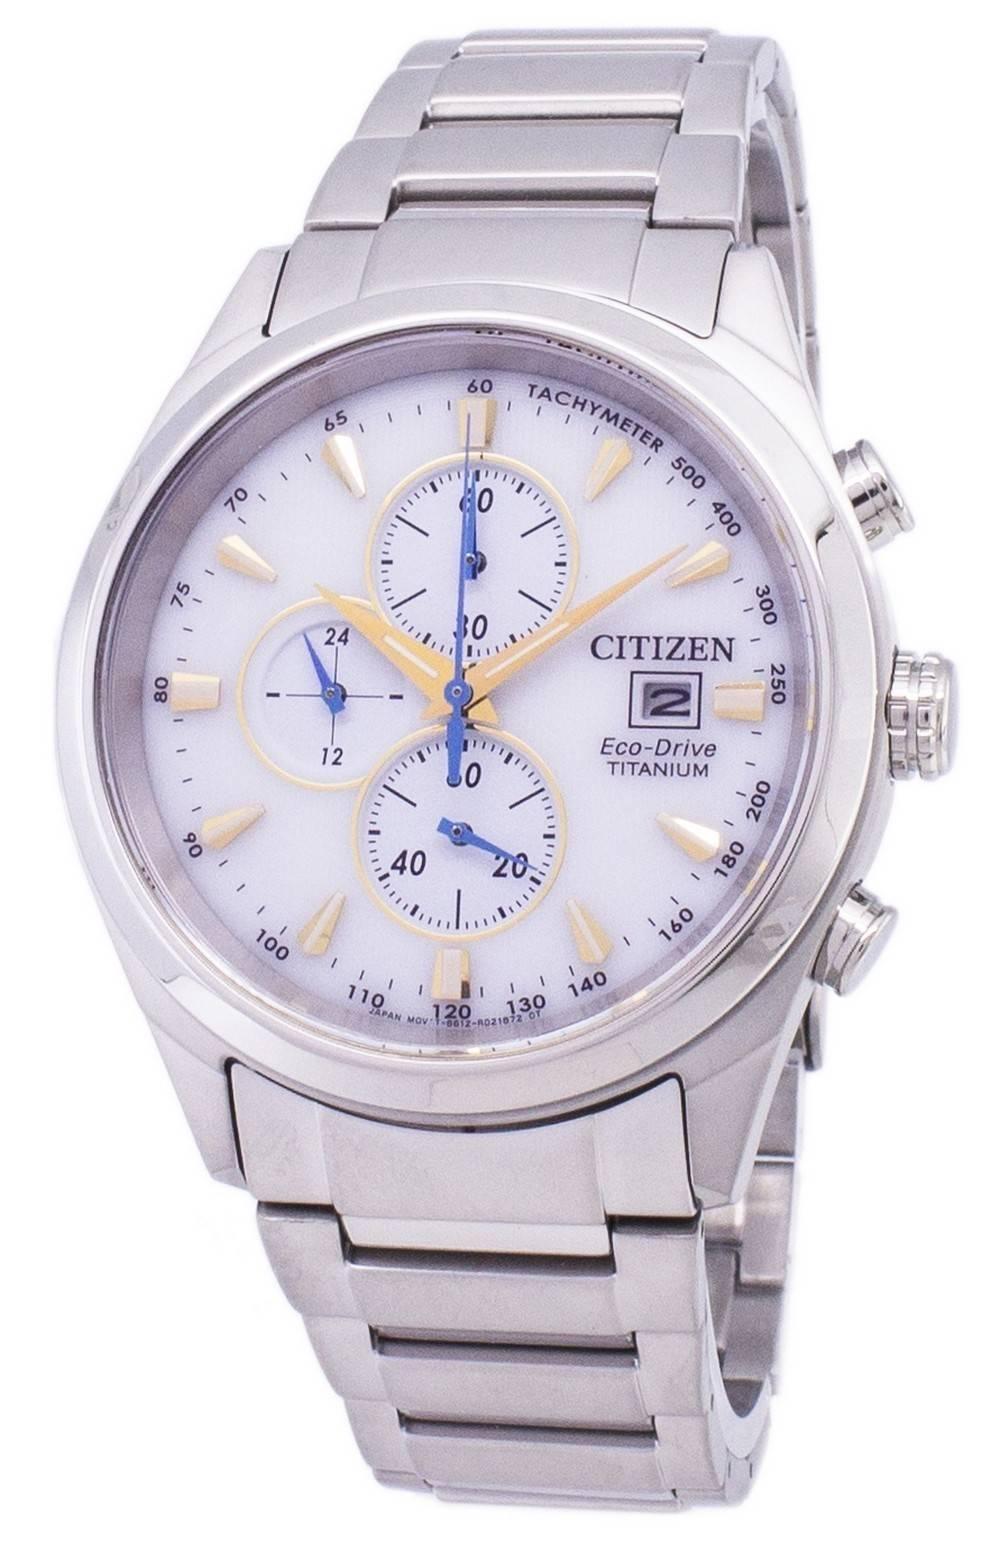 cb0a84f6675 Detalles acerca de Citizen Eco-drive Titanium Cronógrafo Taquímetro  CA0650-82B Reloj de hombre- mostrar título original